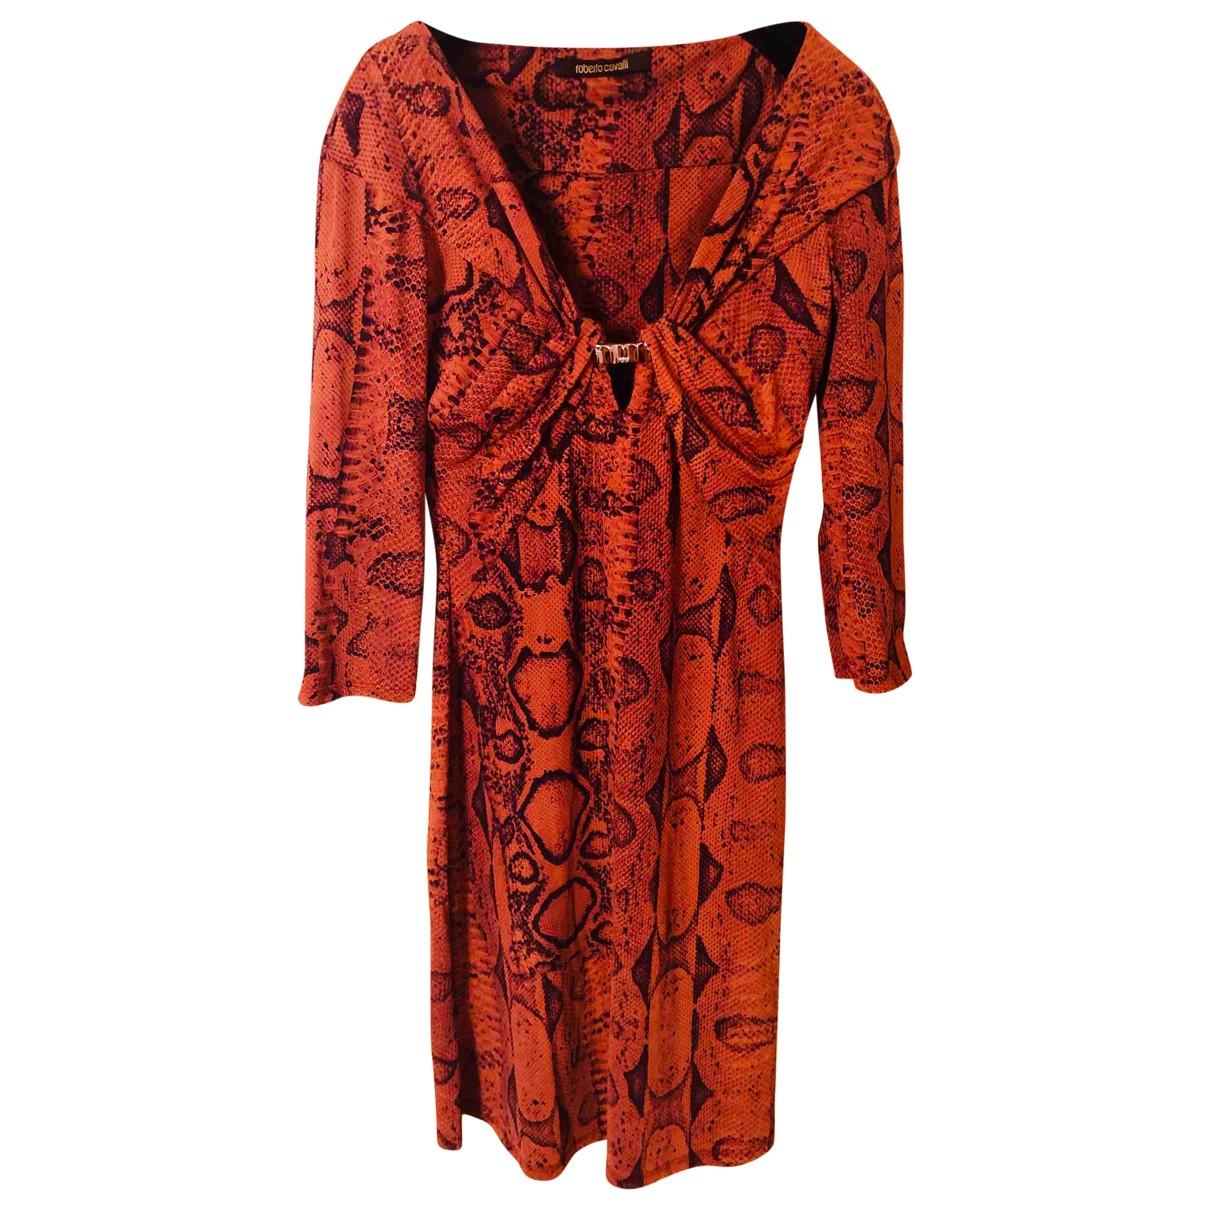 Roberto Cavalli \N dress for Women 40 IT